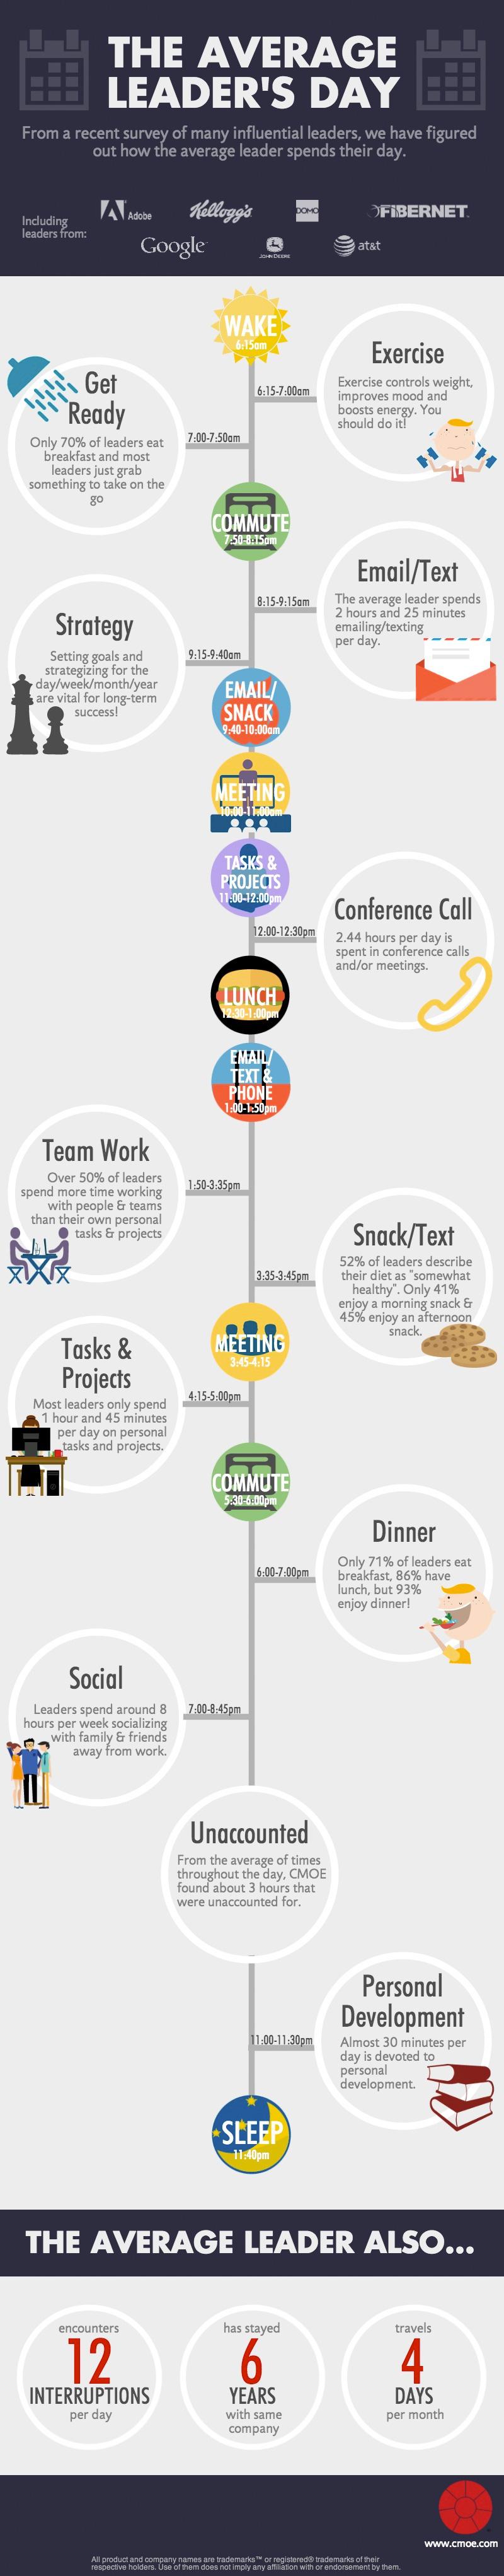 Habits-of-Effective-Leaders